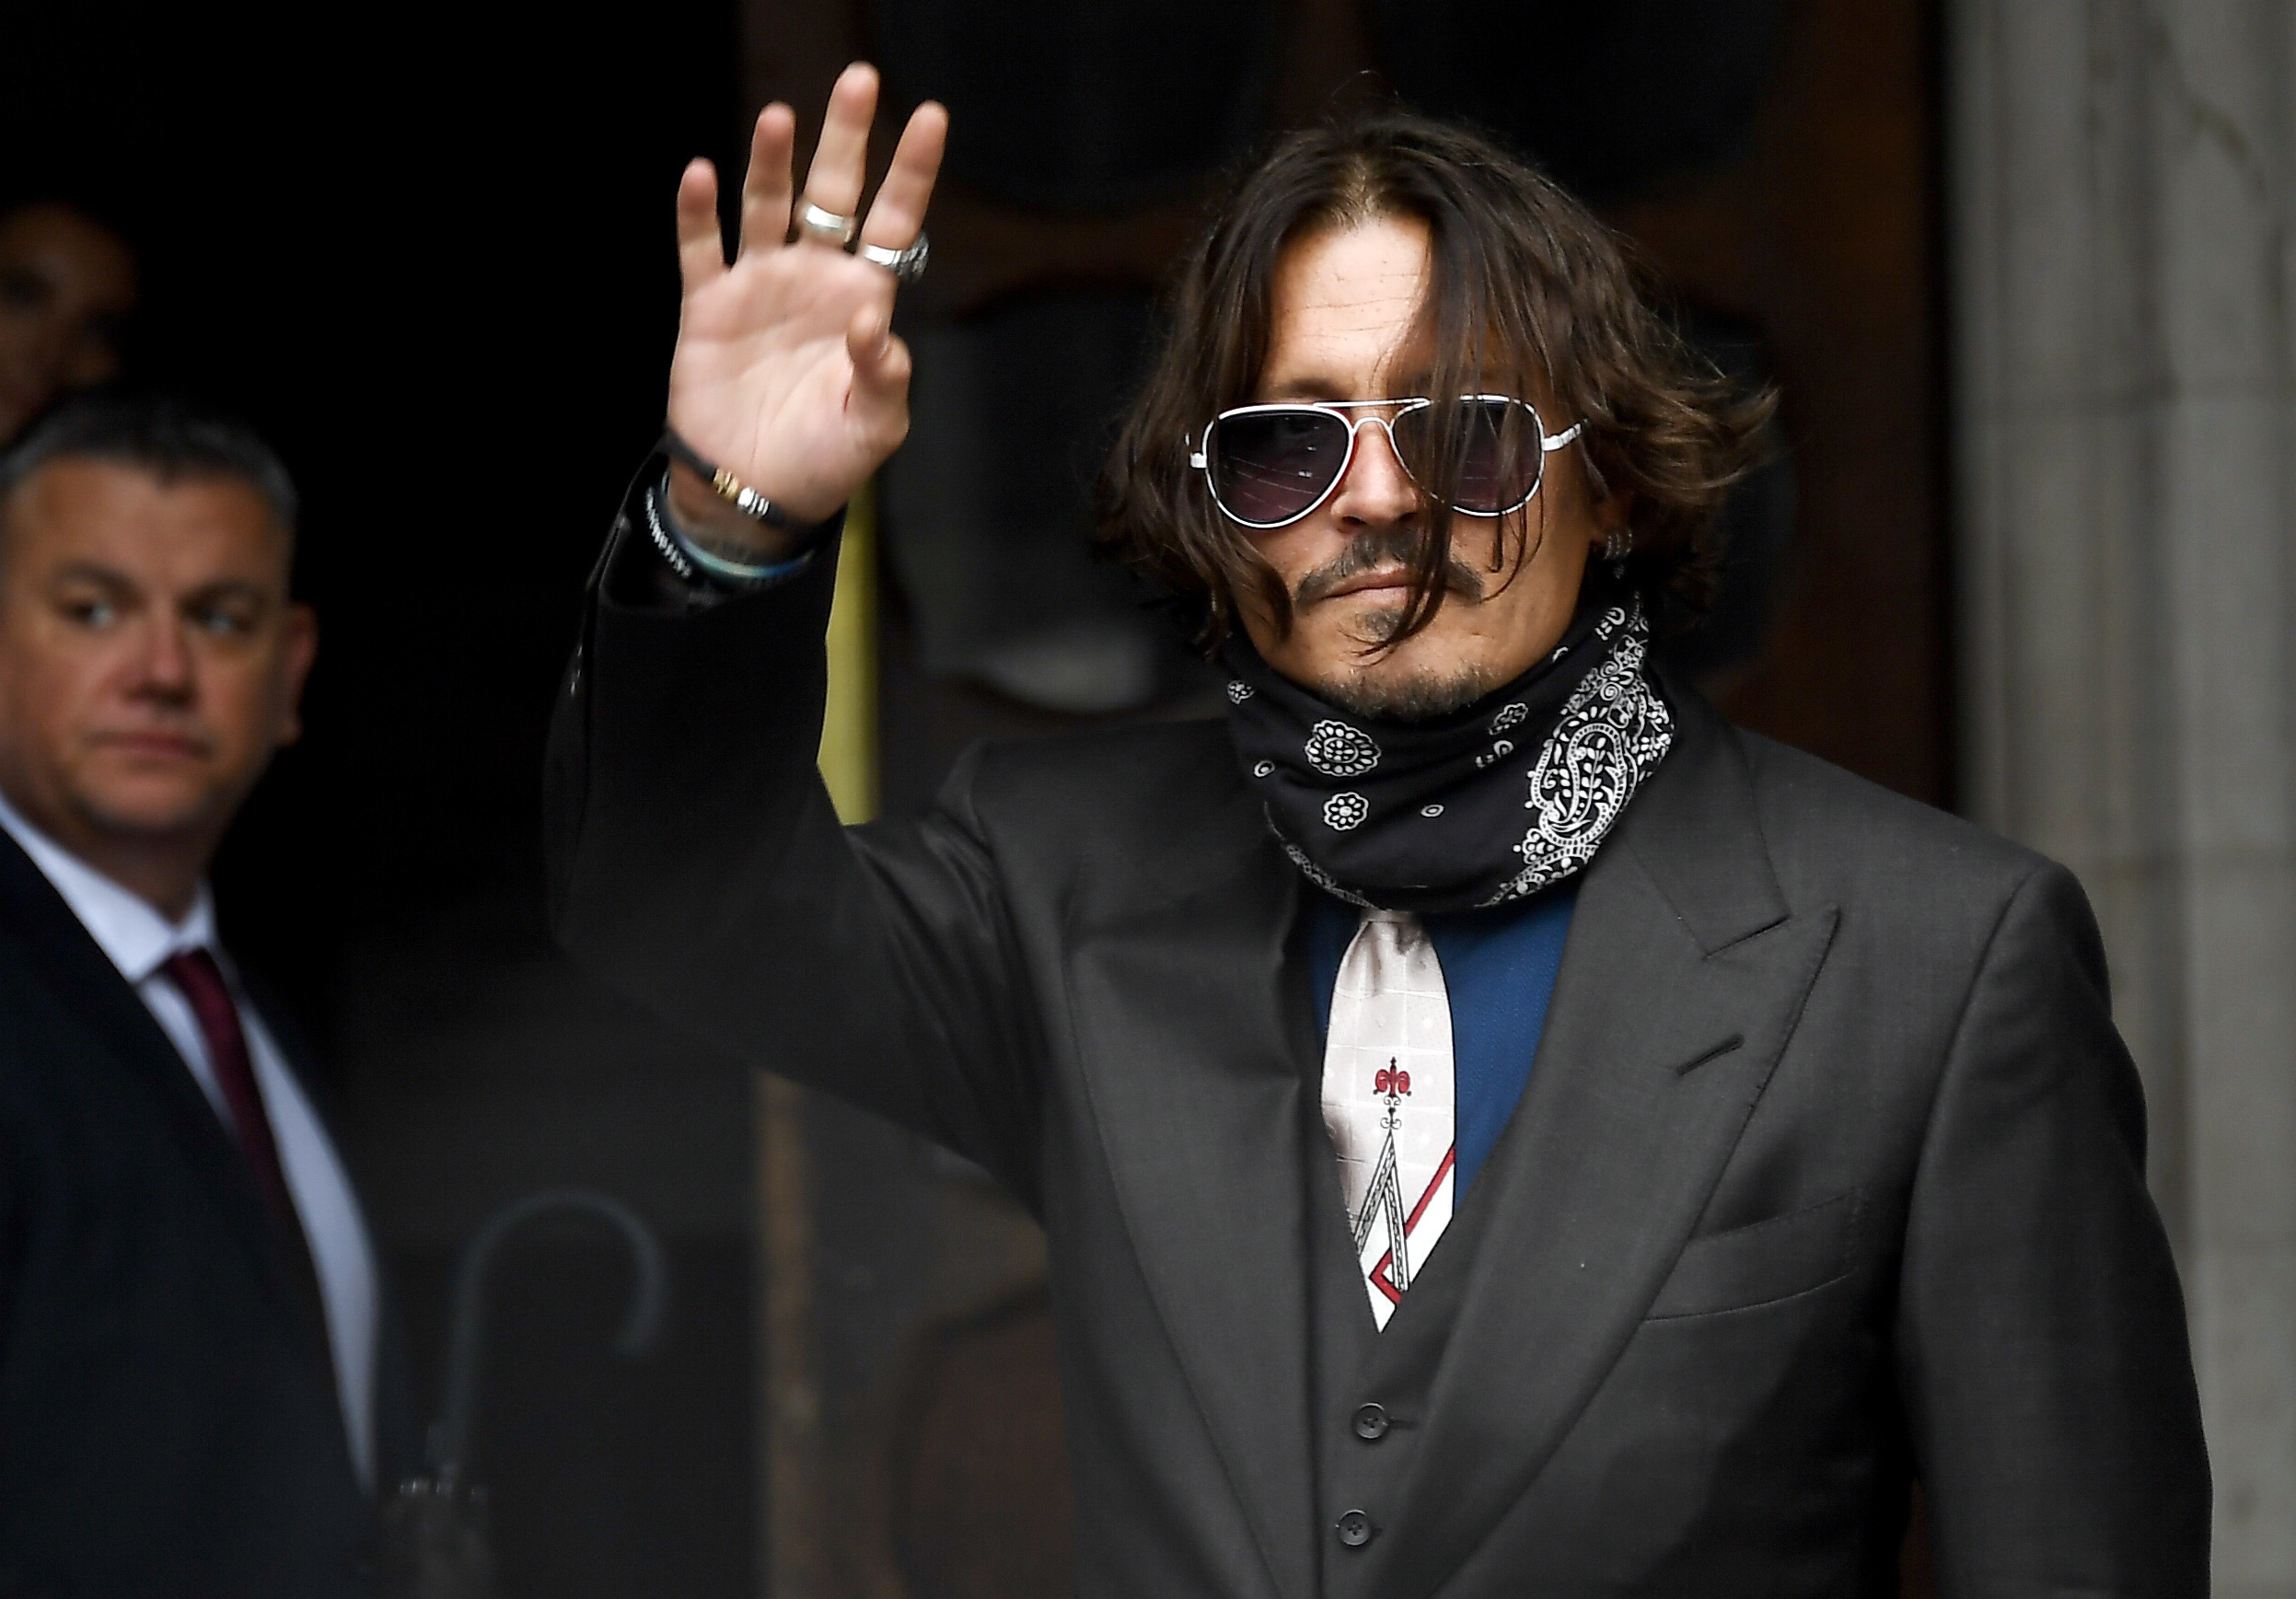 Johnny Depp Biography, Net Worth 2020